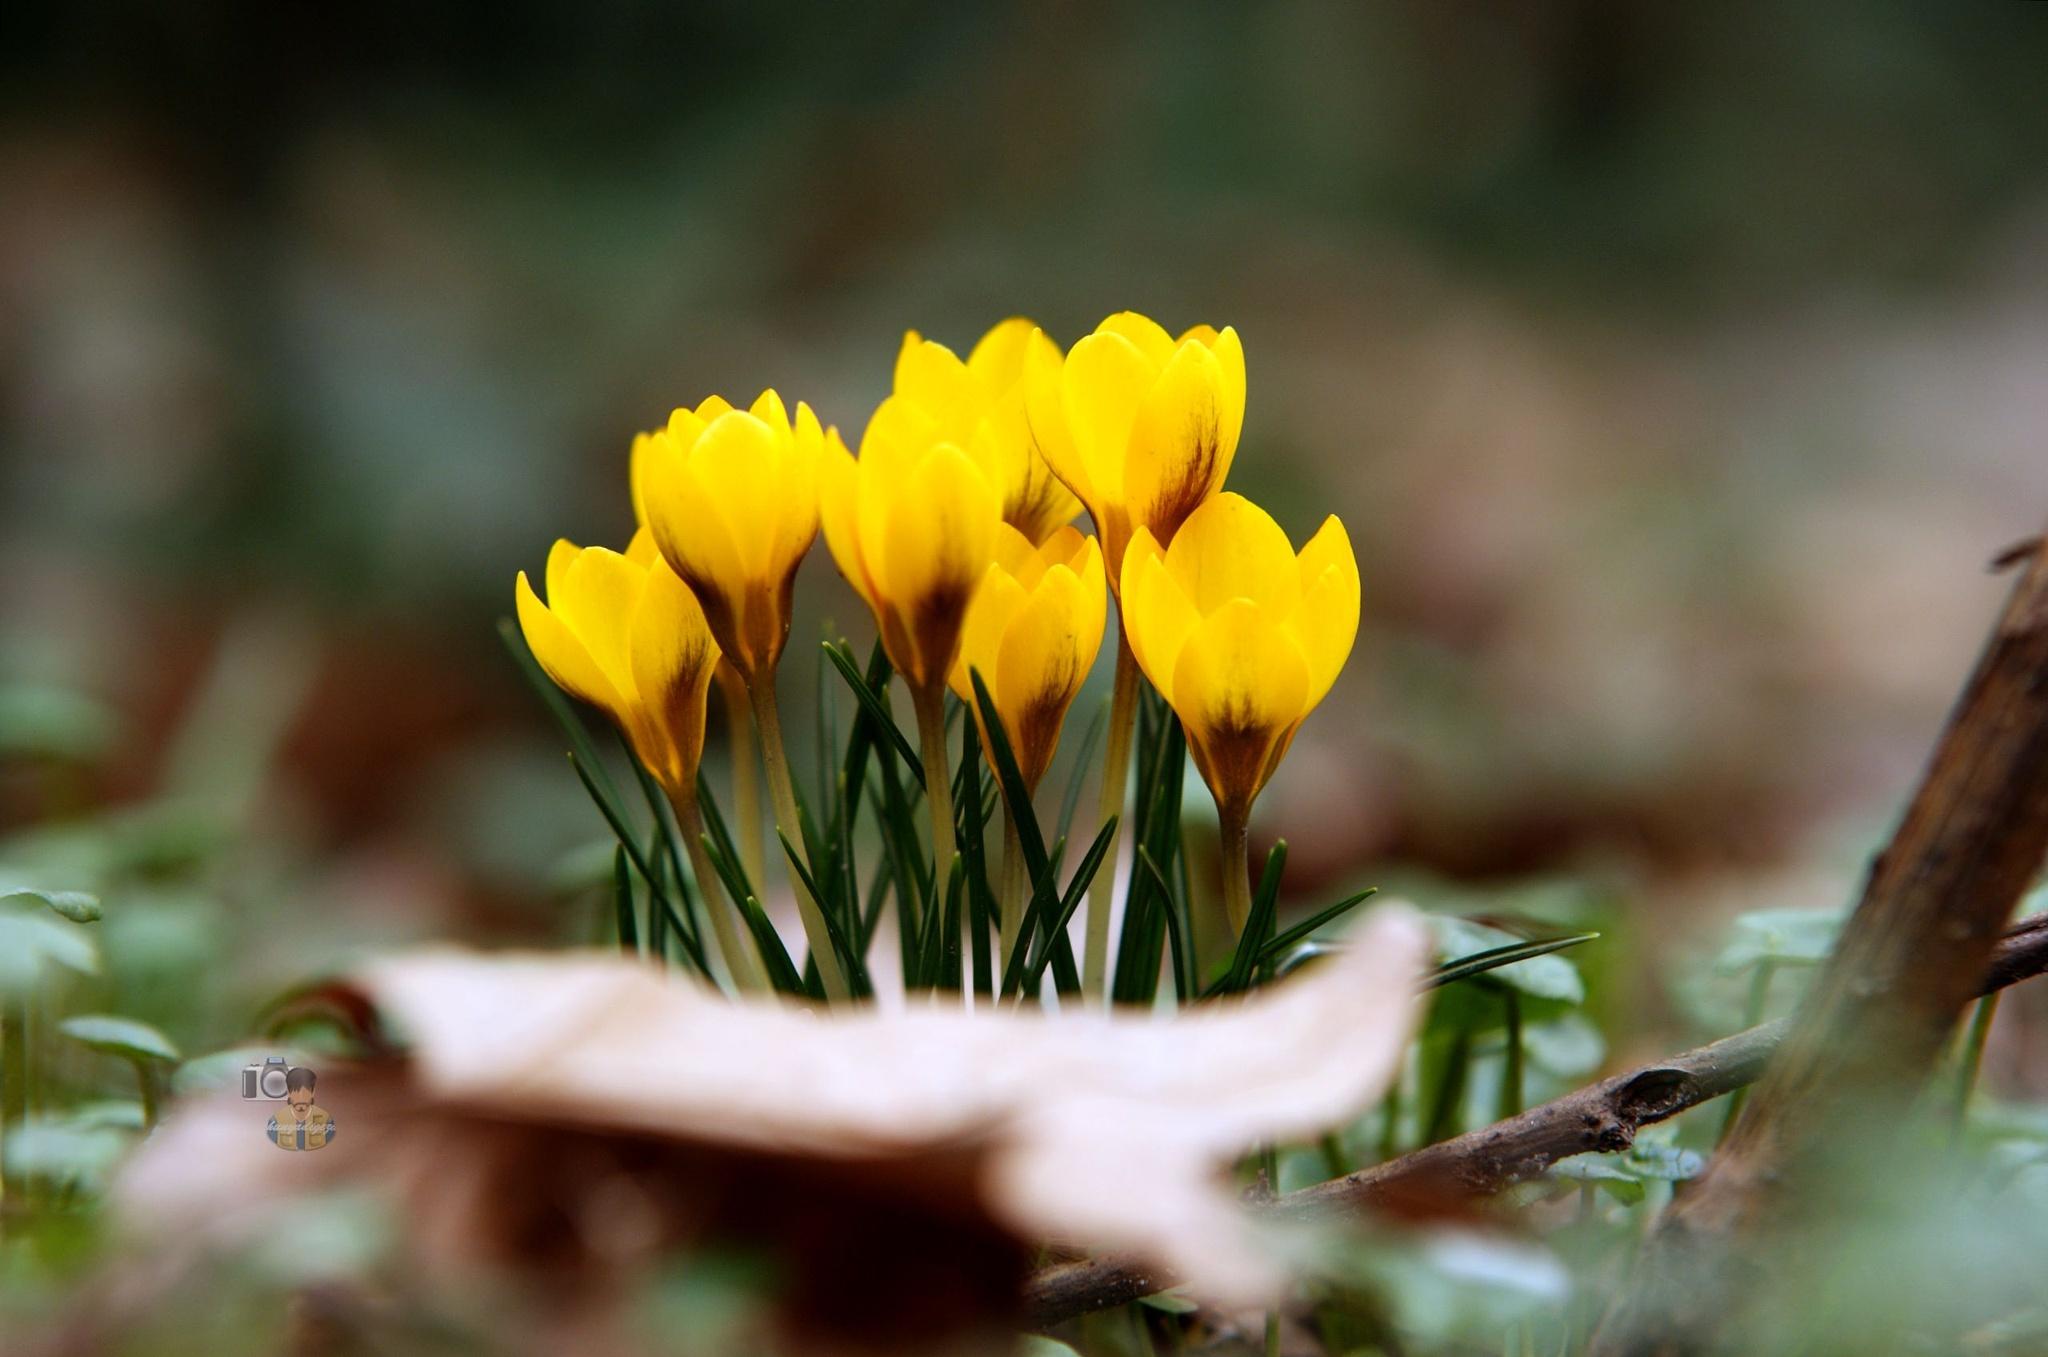 28.02.16. Crocus yellow by hunyadigeza